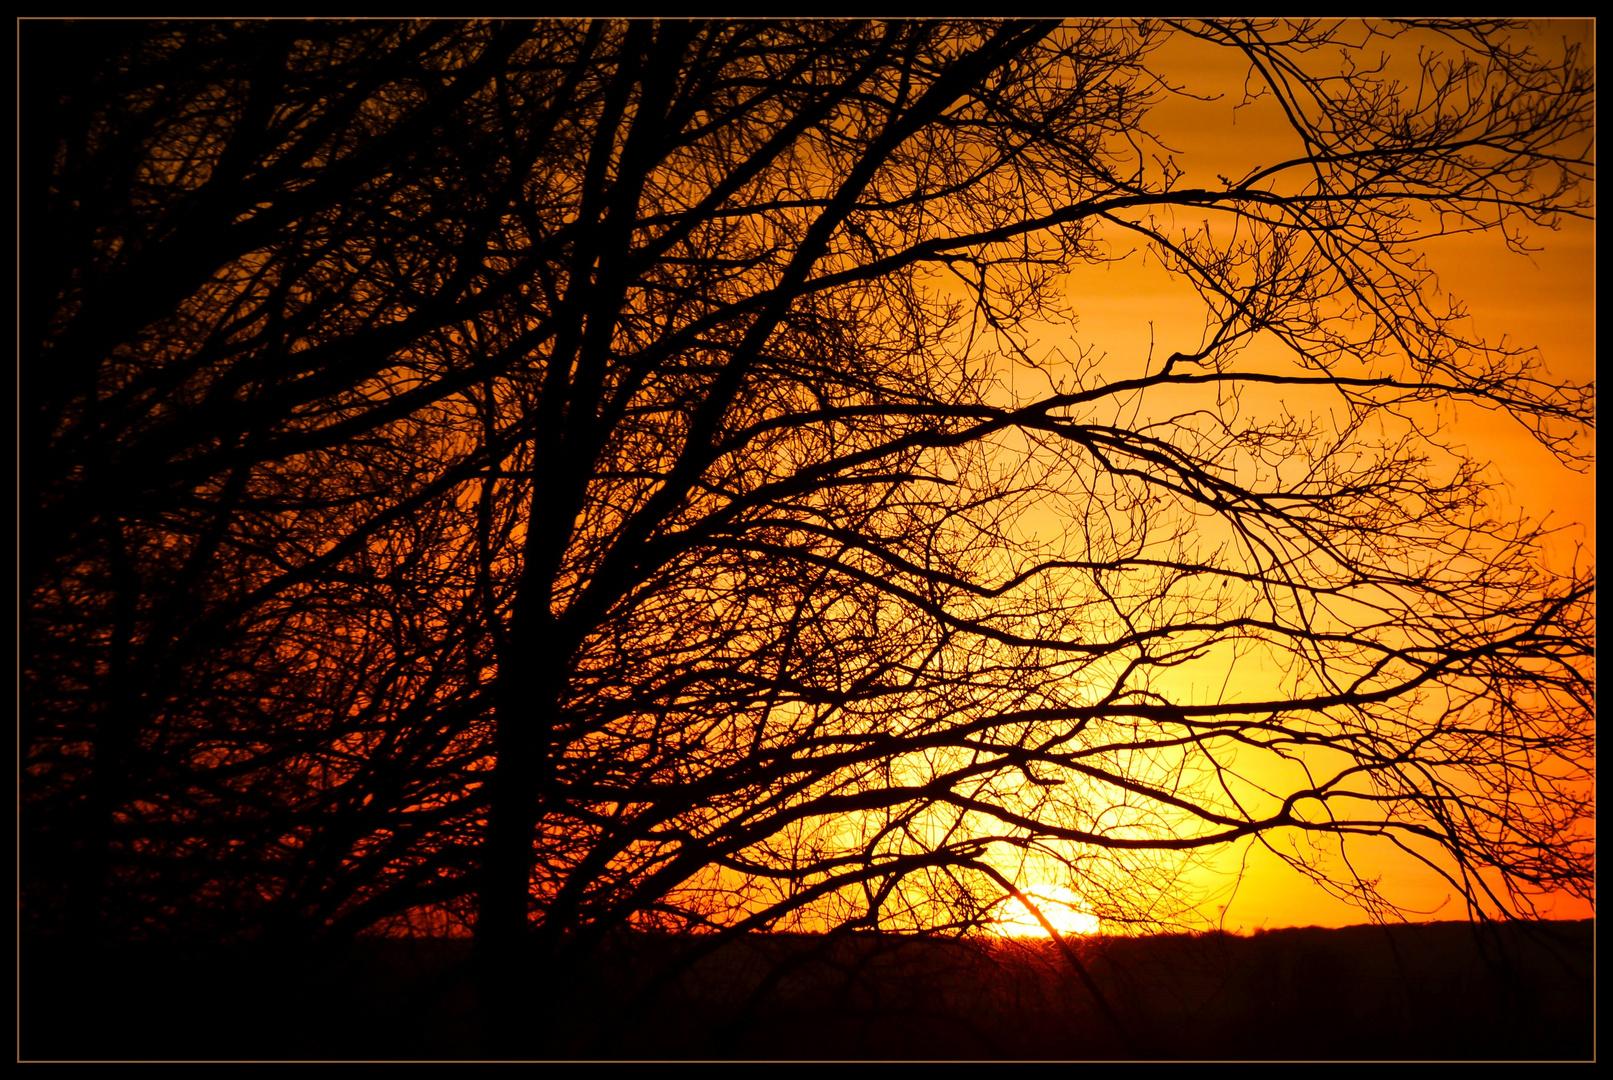 """African sun"" in Hessen"